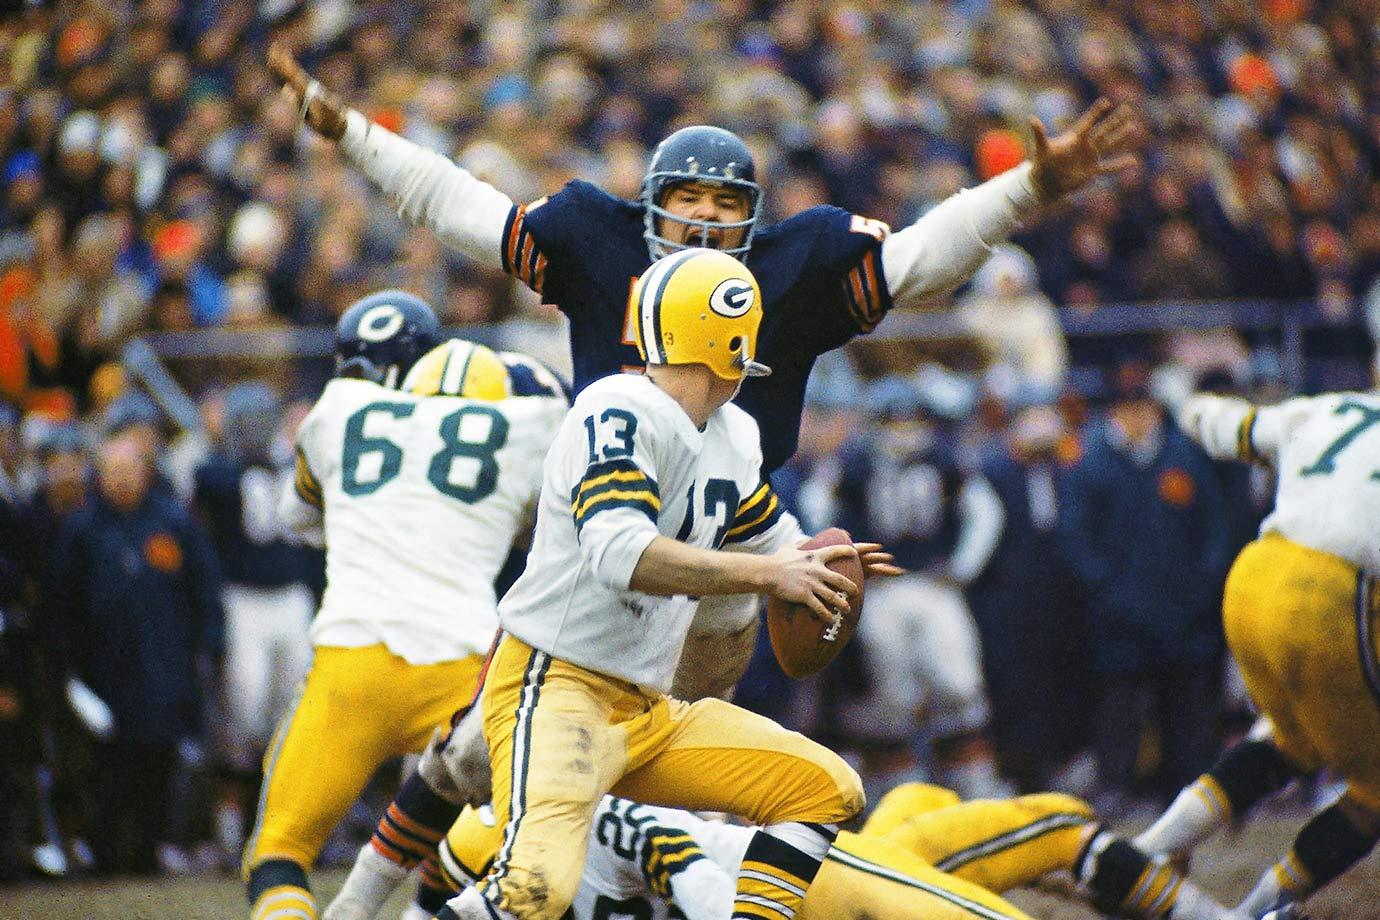 Dec. 1968 — Chicago Bears vs. Green Bay Packers